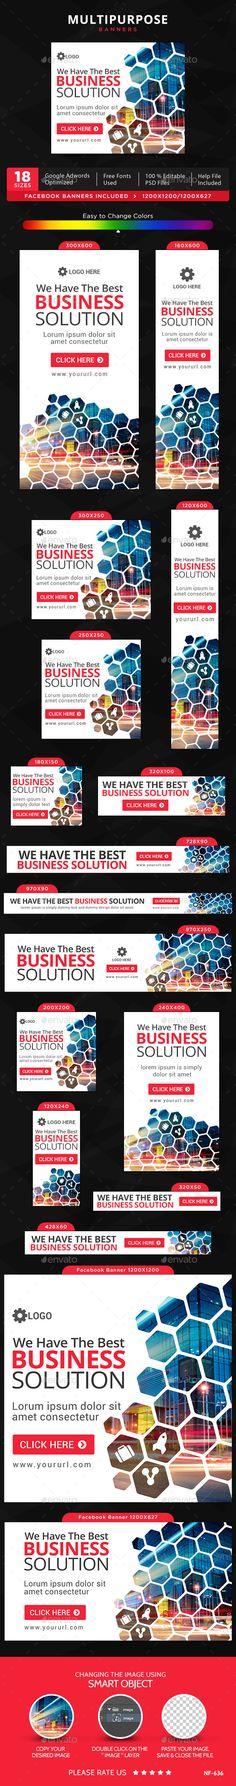 Multipurpose Banners Template #design #ads Buy Now: http://graphicriver.net/item/multipurpose-banners/12878008?ref=ksioks